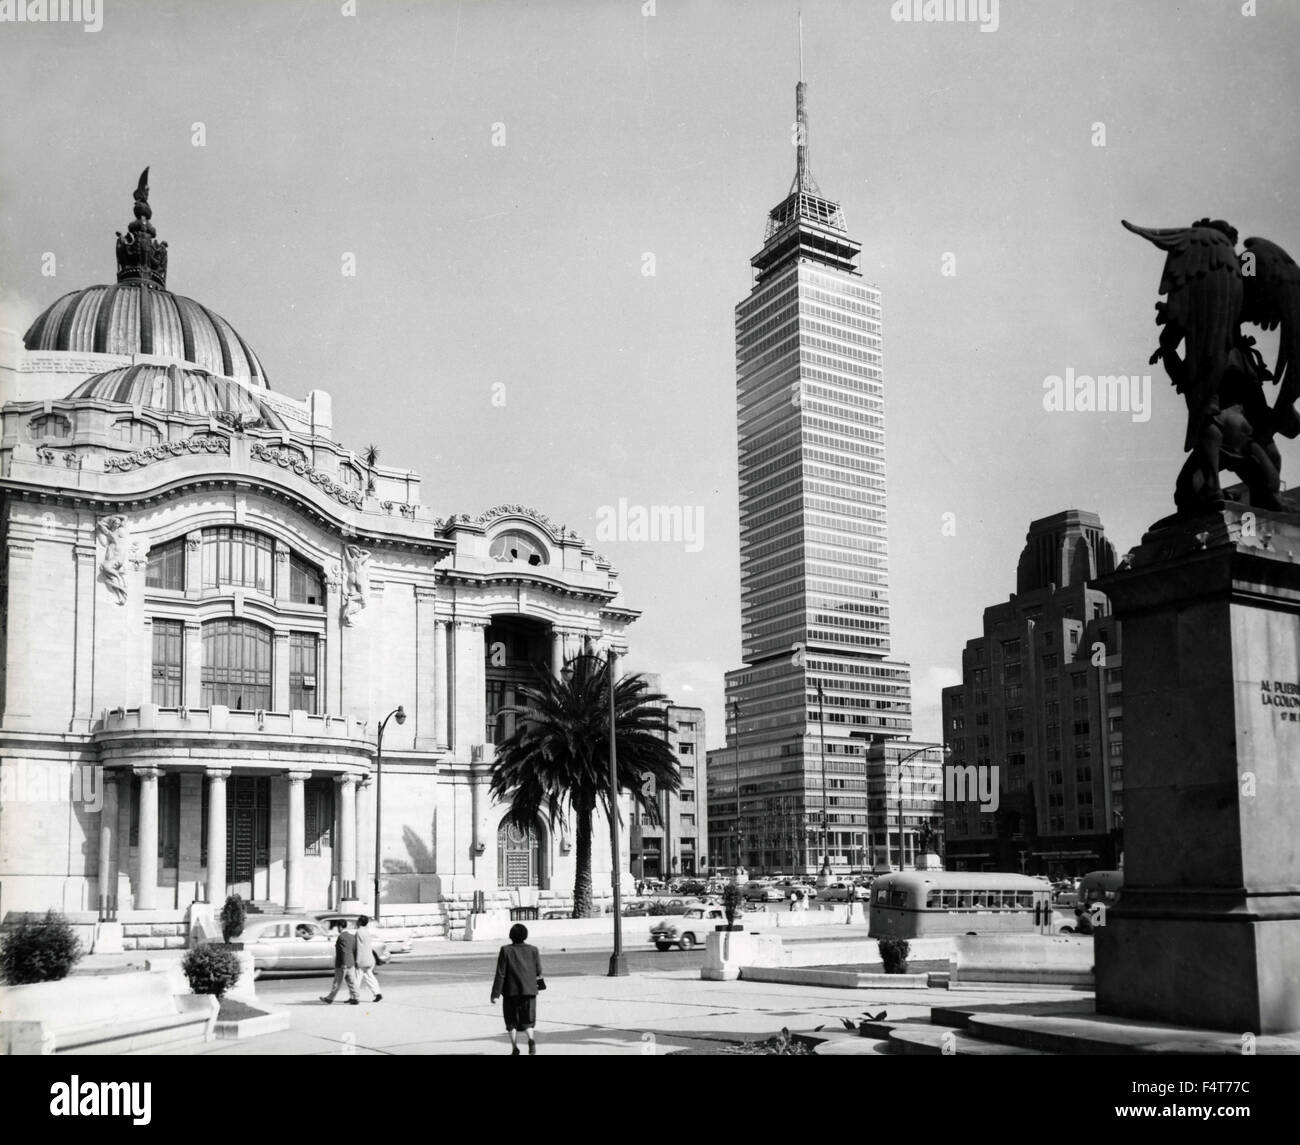 Palast der schönen Künste, Mexiko City, Mexiko Stockbild